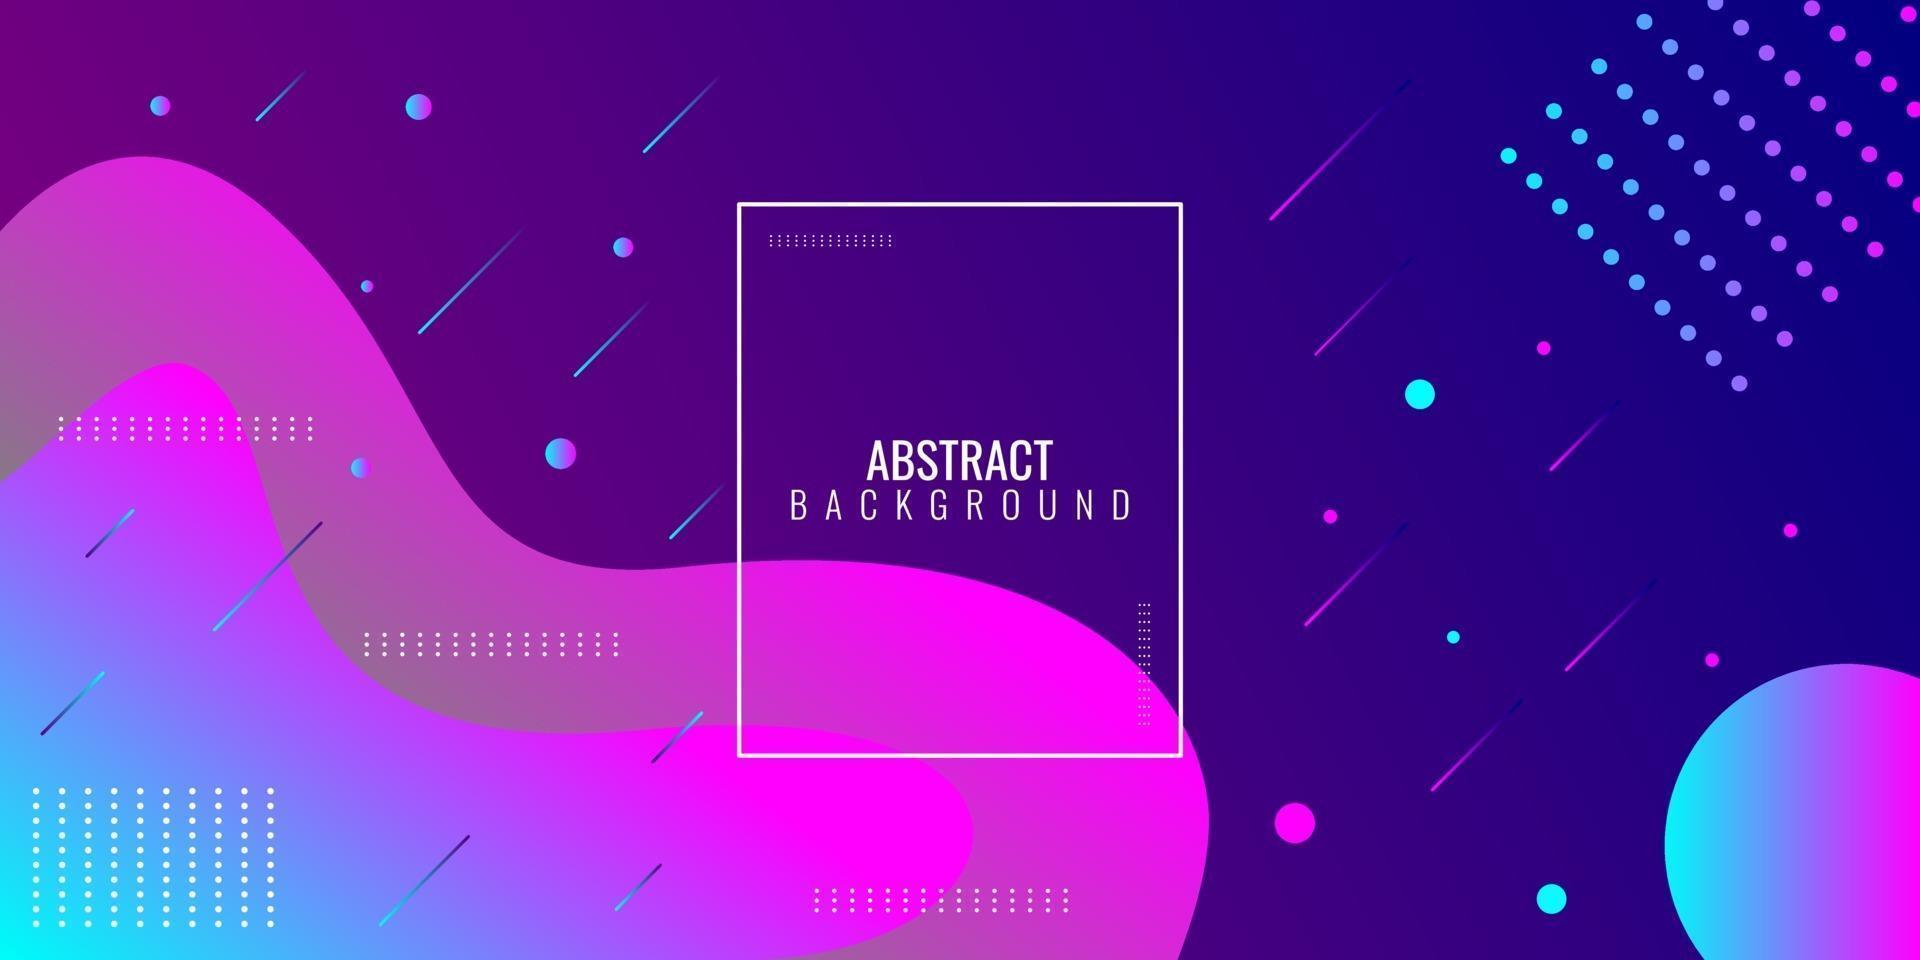 moderne abstrakte lila und blaue Farbverlaufswellengeometrie vektor